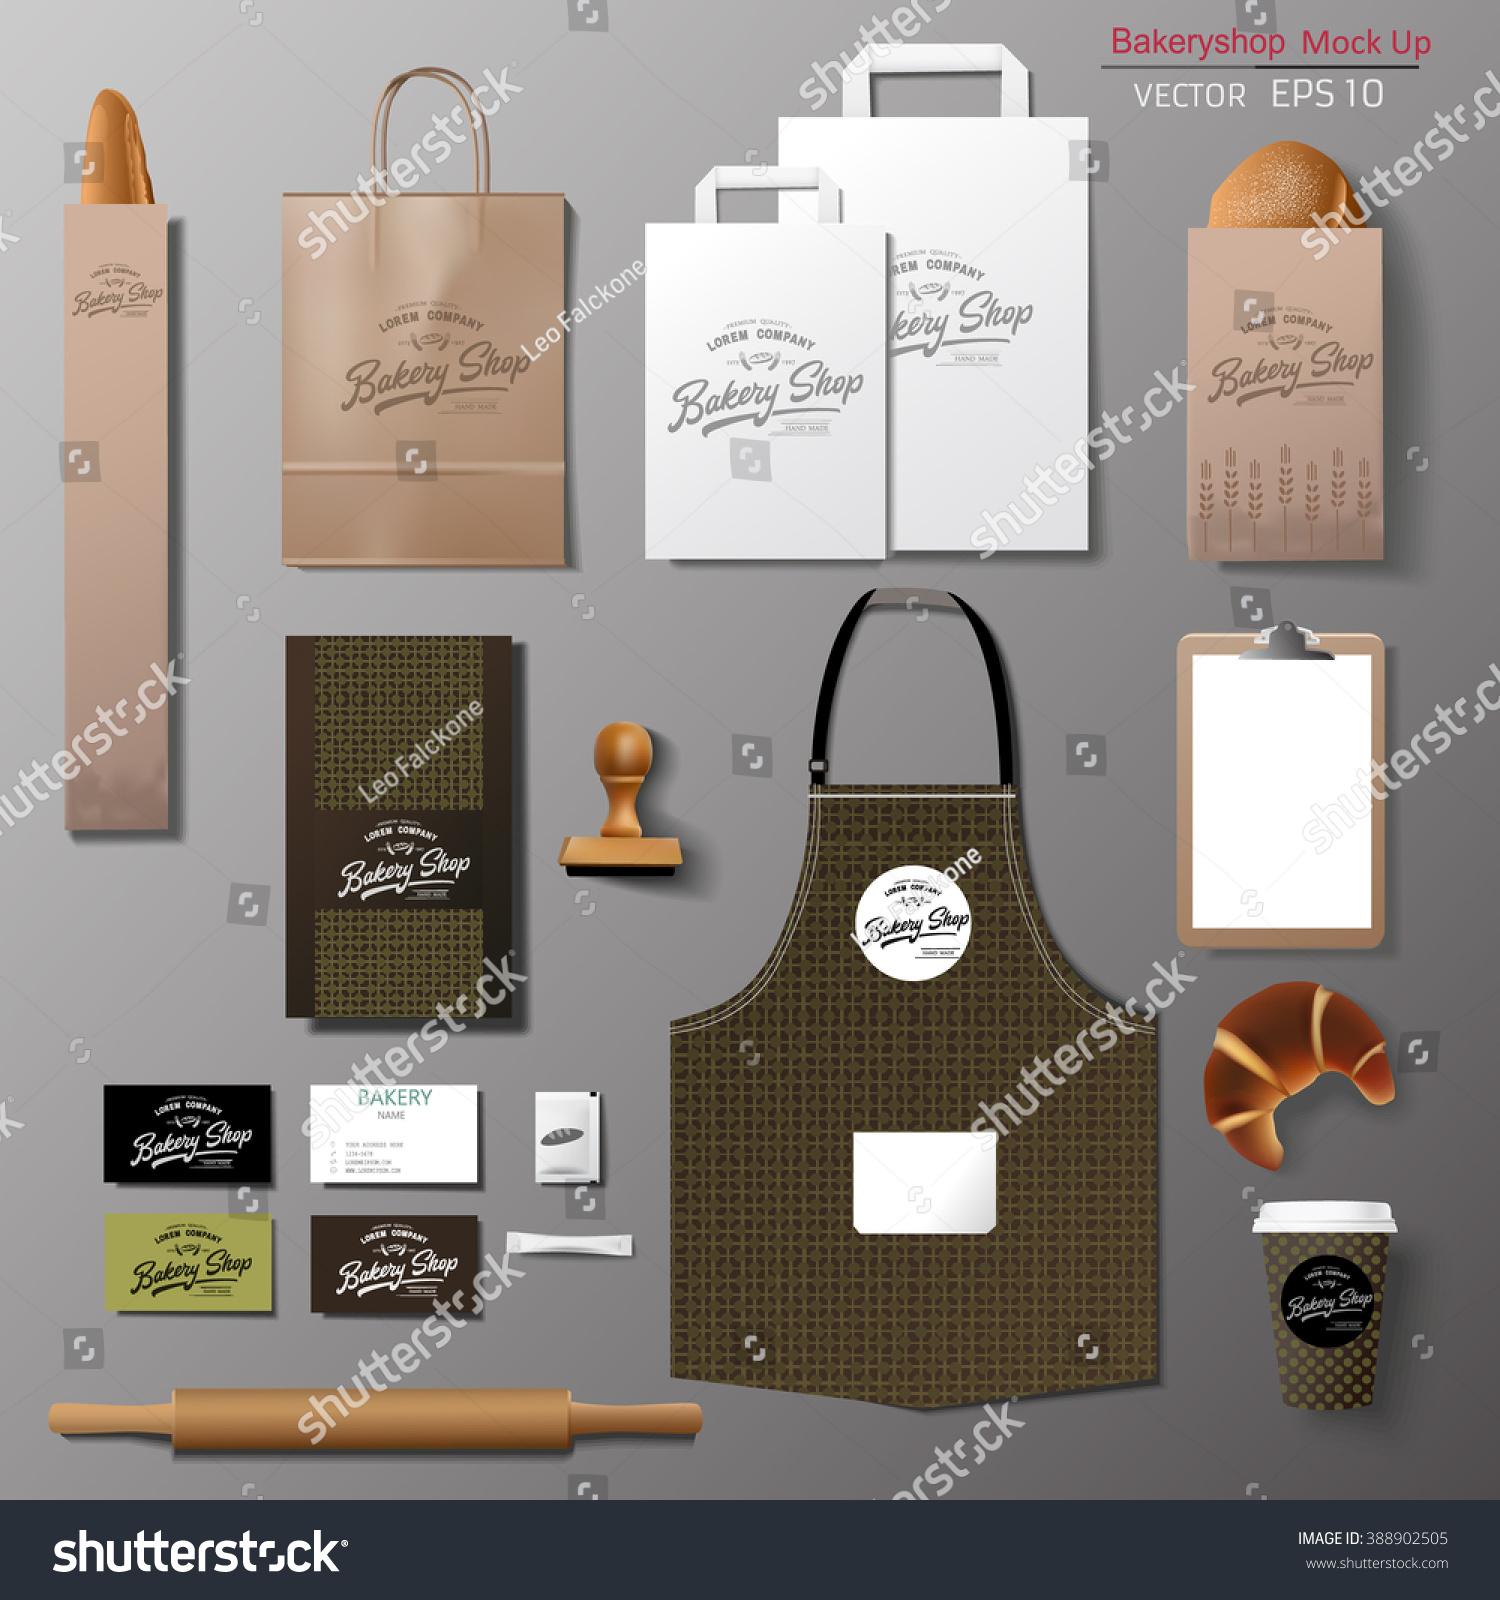 Vector Bakery Corporate Branding Identity Template Stock